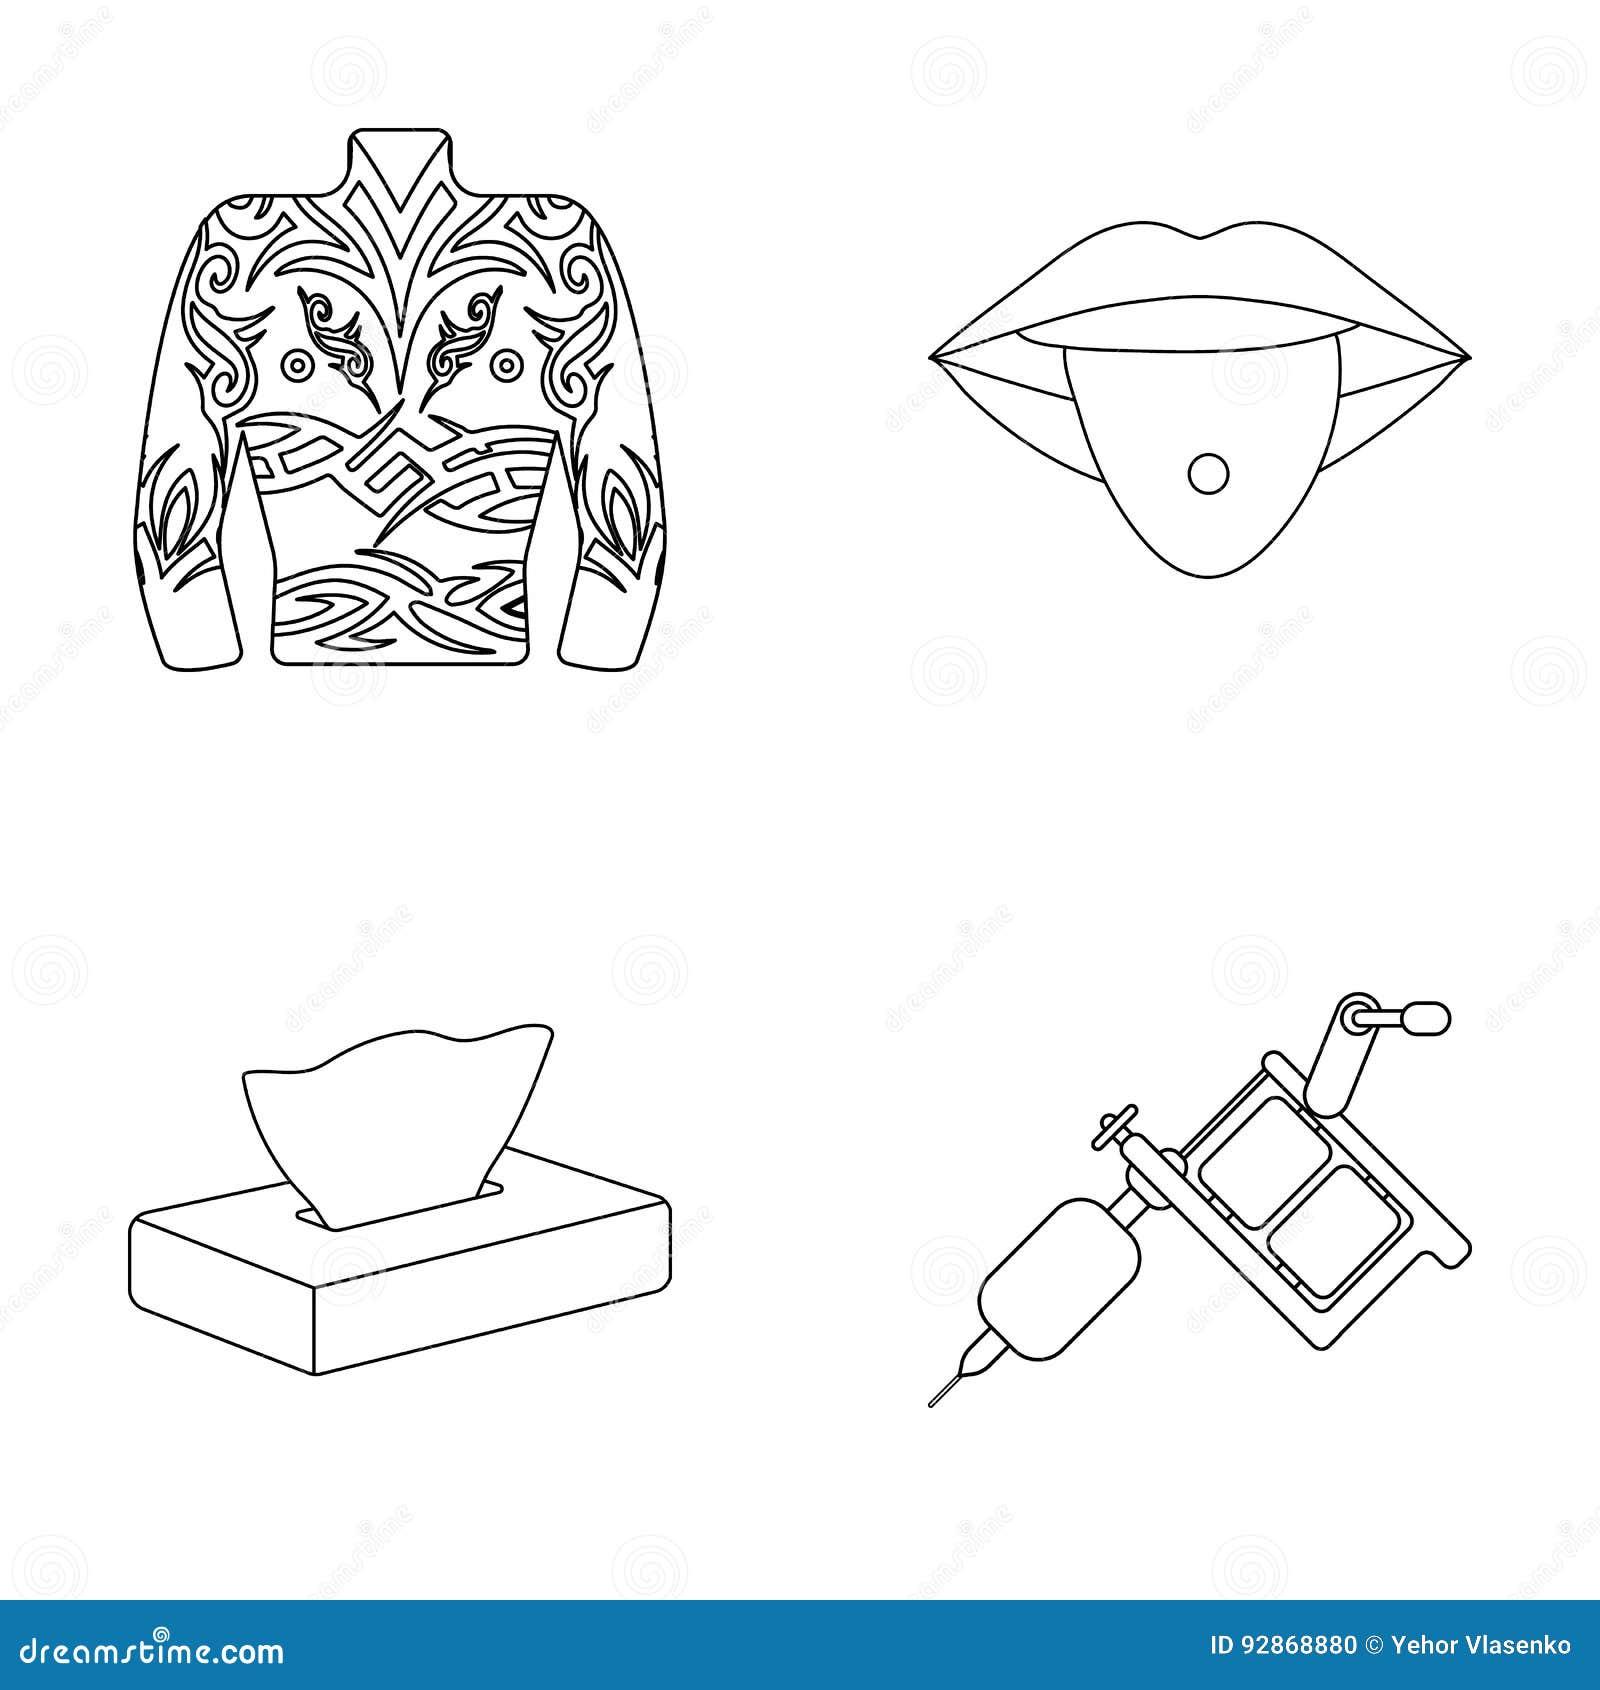 piercings cartoons  illustrations  u0026 vector stock images